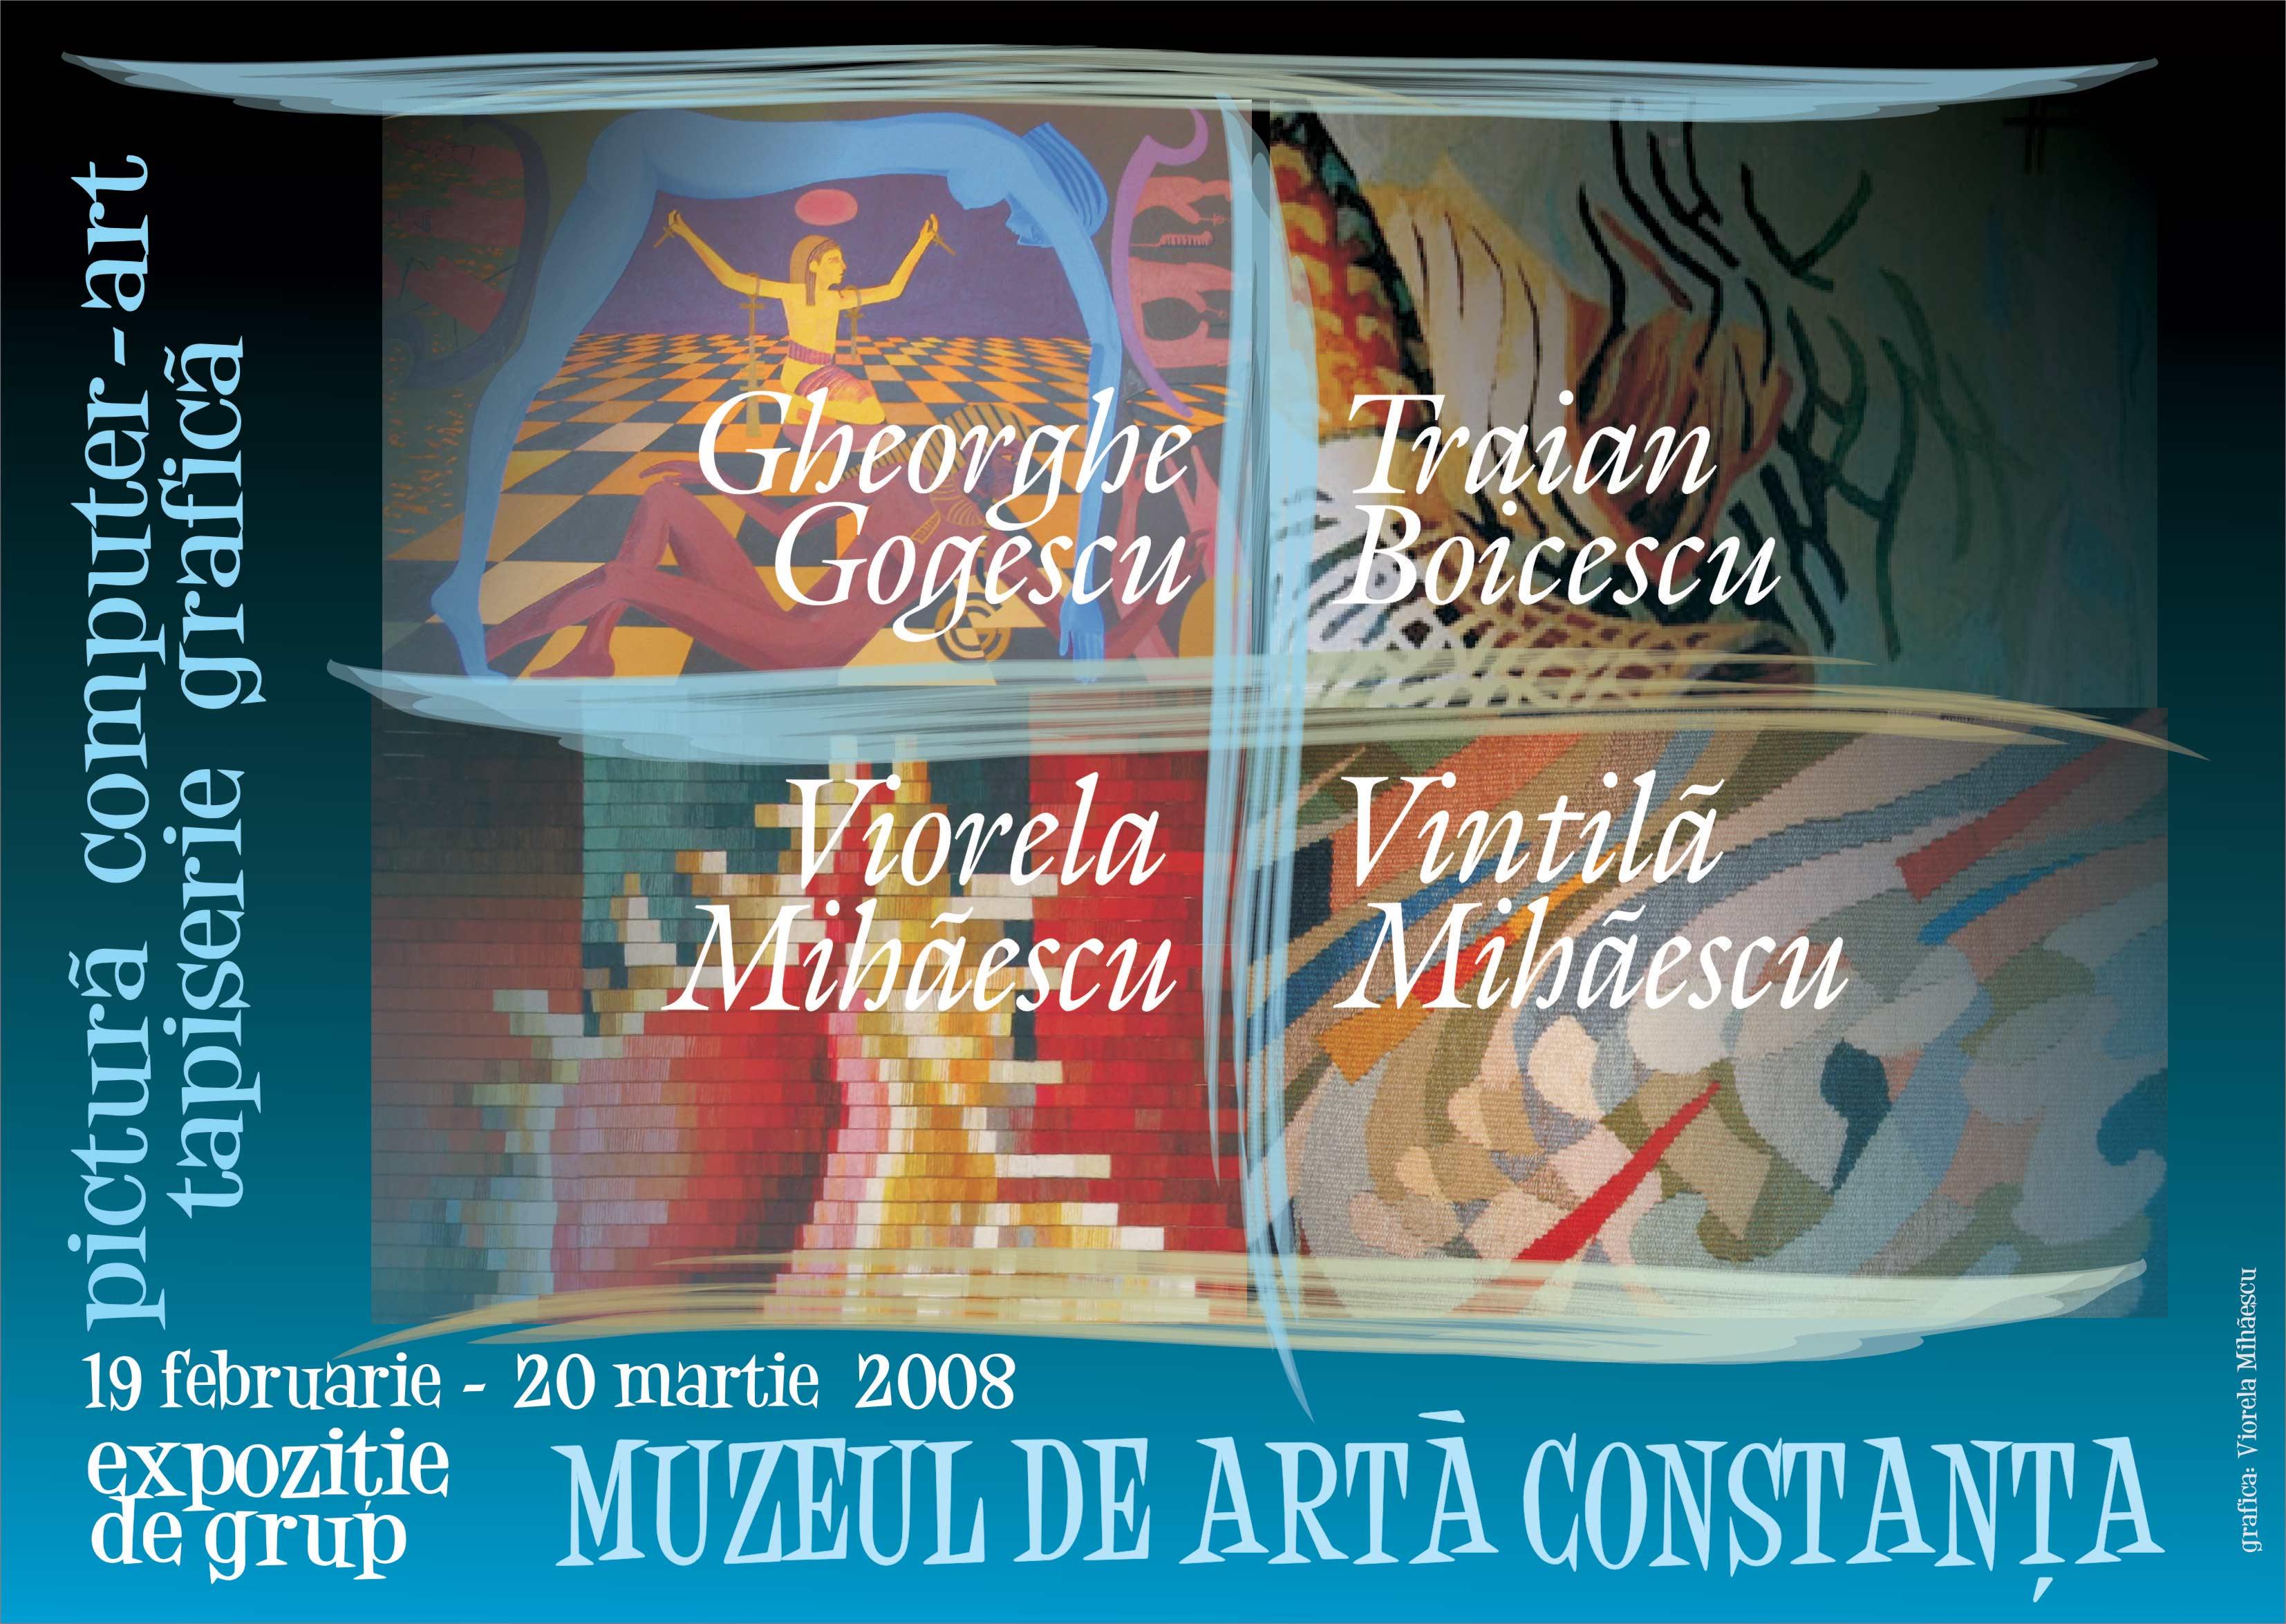 Afisul-Expo-grup-Muzeu-Cta